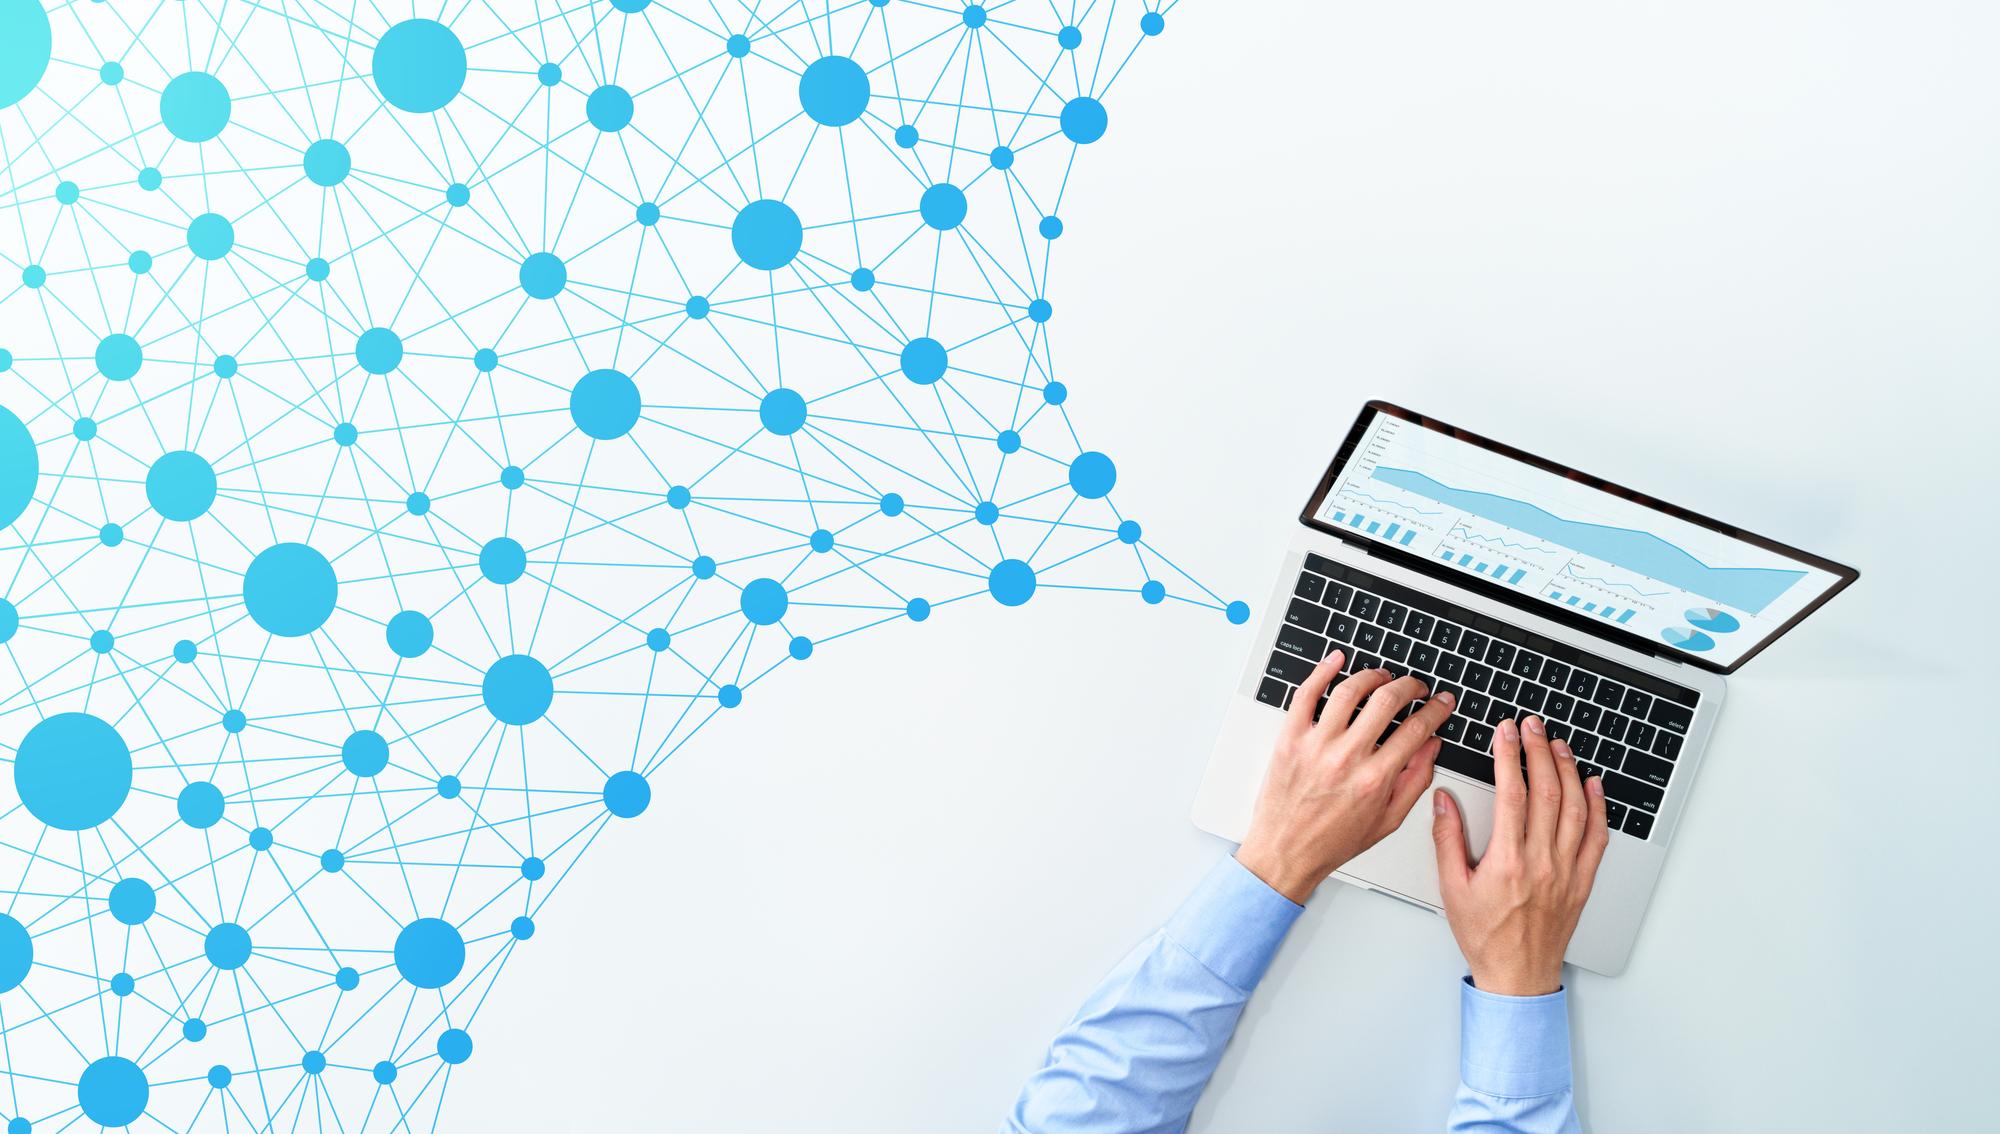 Webサイトの「トラフィック分析ダッシュボード」でWeb集客分析を効率化する方法